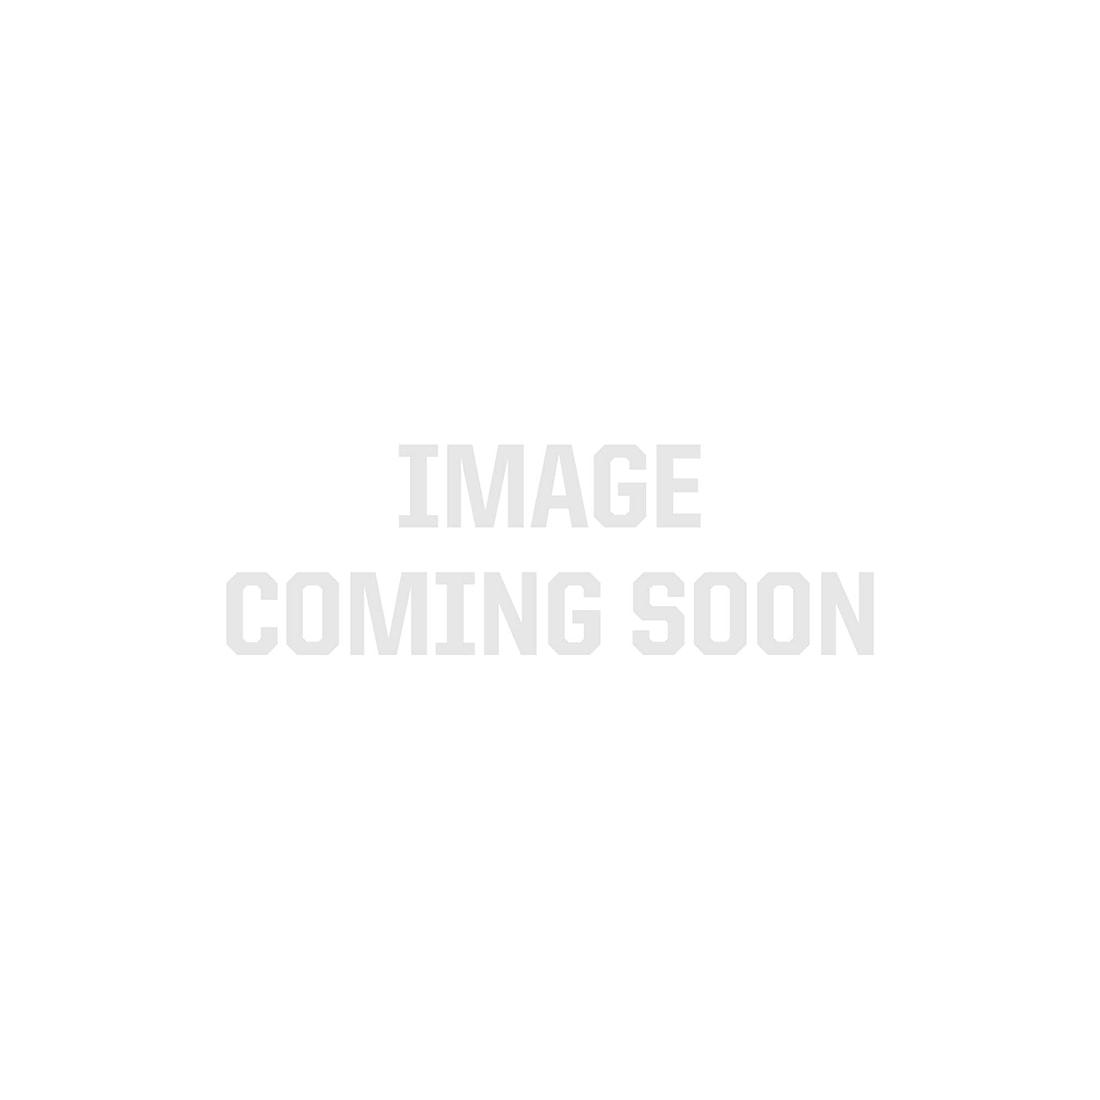 Warm White 5630 Single Row CurrentControl LED Strip Light, 70/m, 5.1mm wide, Sample Kit